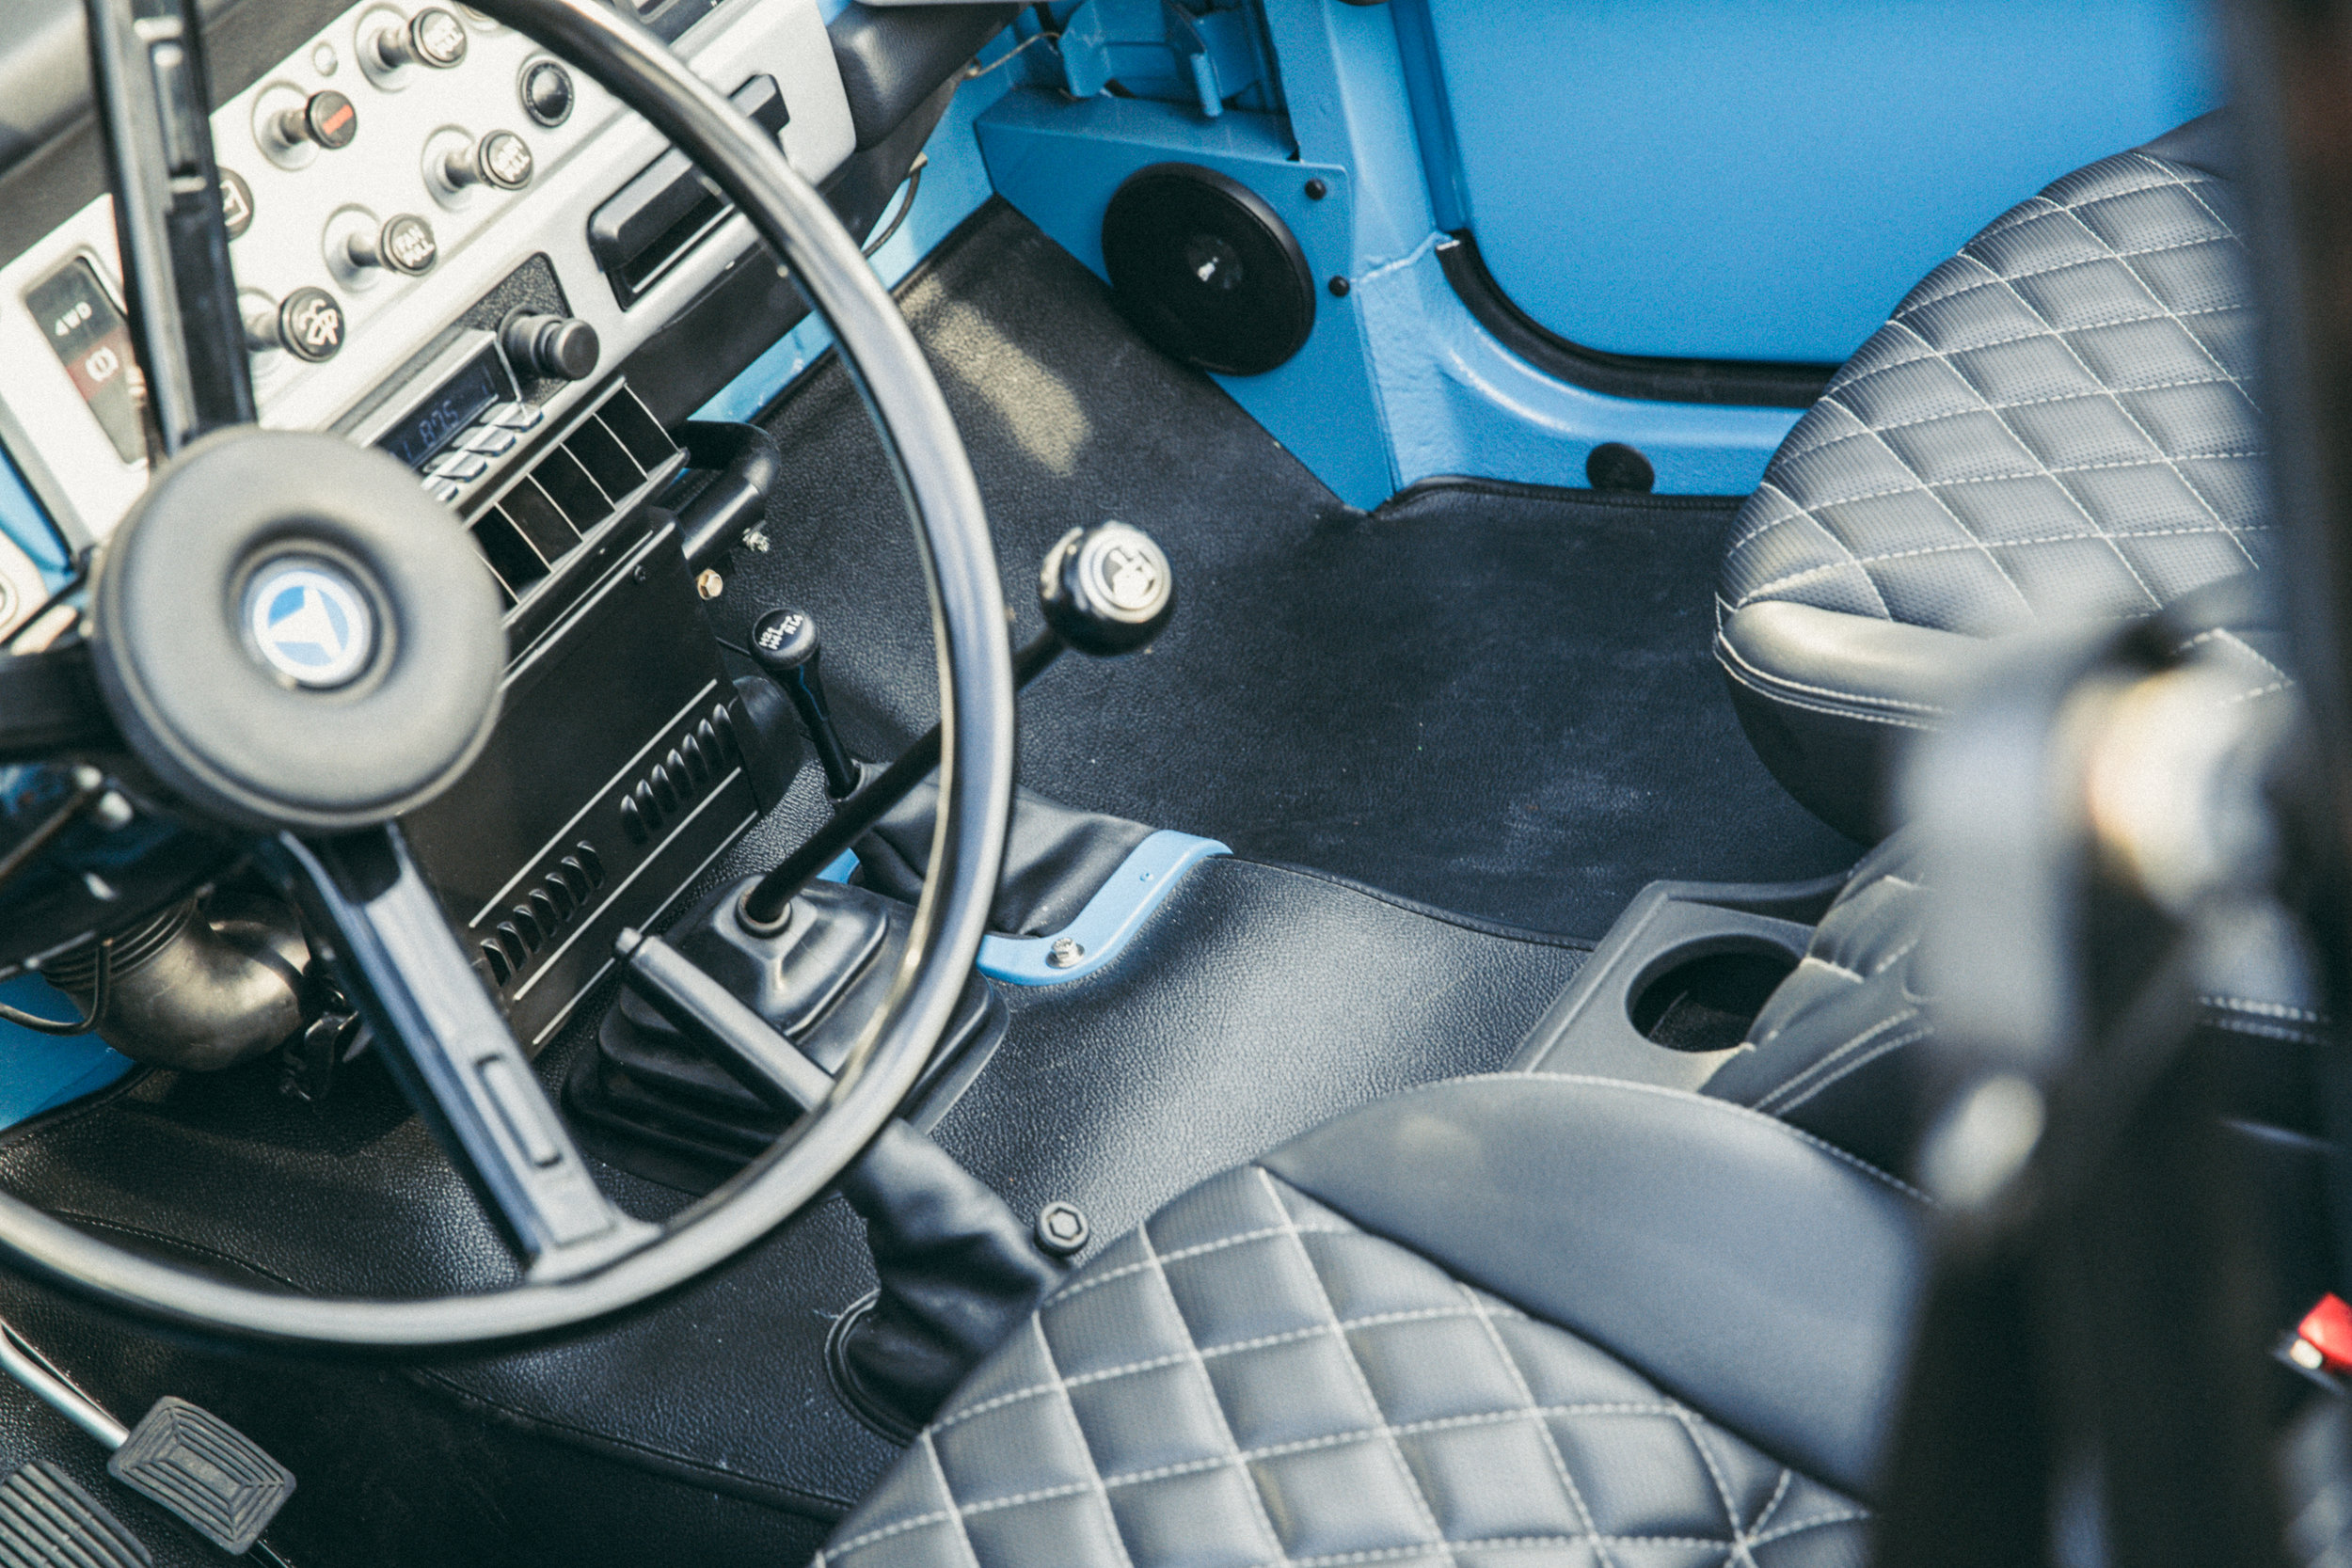 LegacyOverland_1980_ToyotaLandCruiser_FJ40_opentop_6.JPG